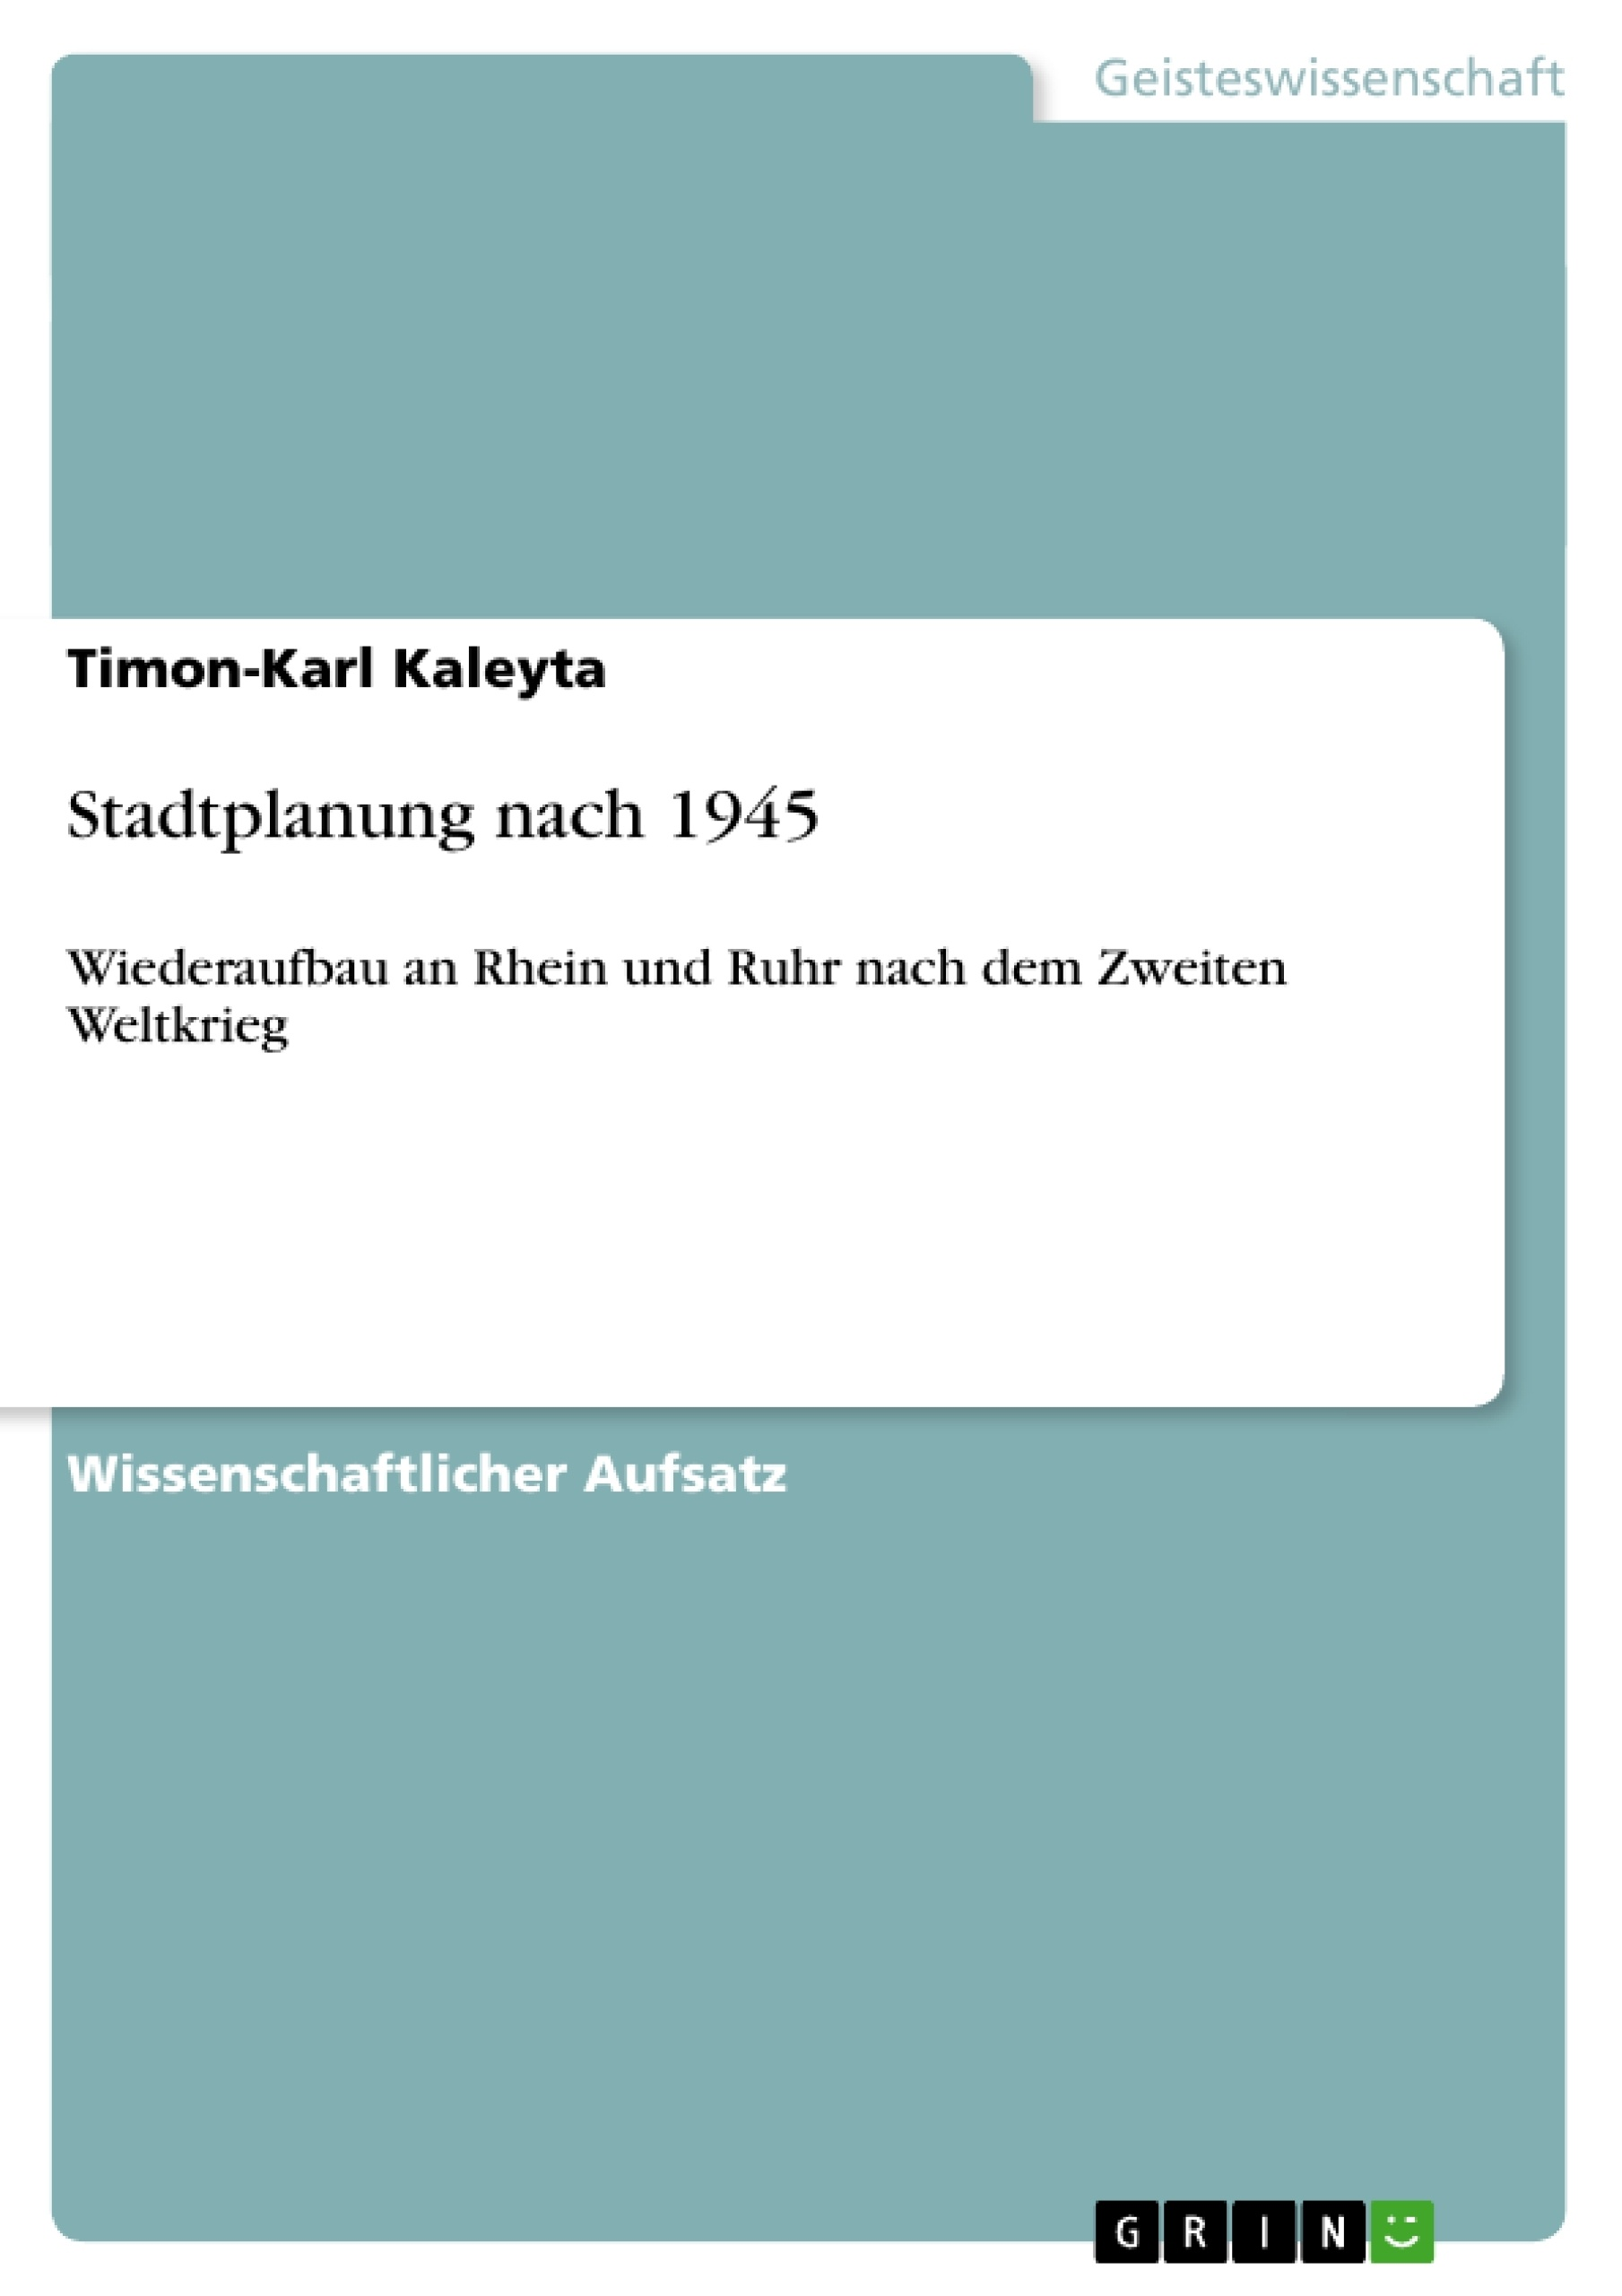 Titel: Stadtplanung nach 1945